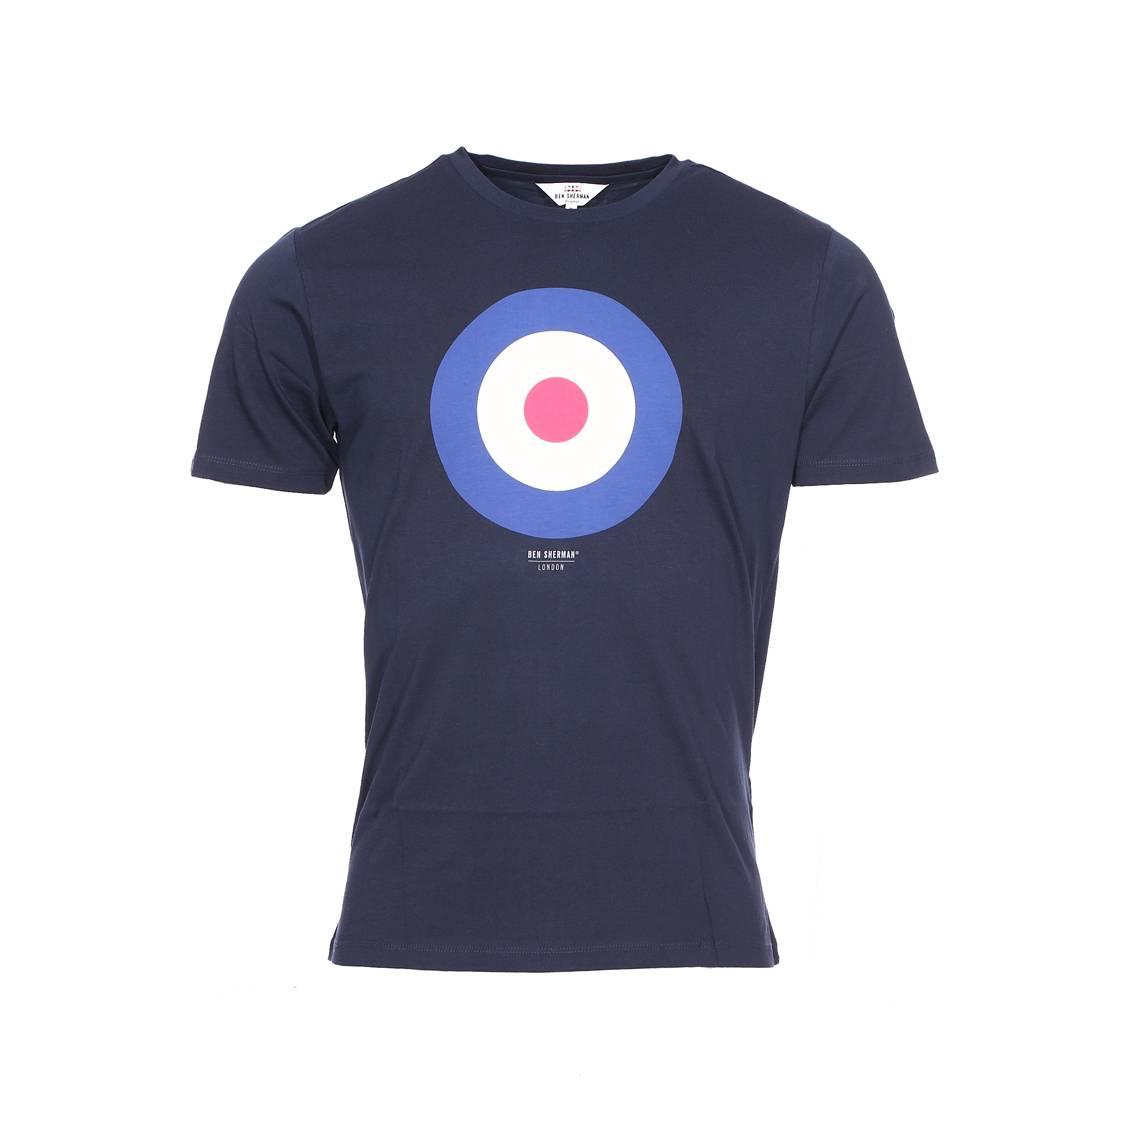 Tee-shirt col rond  bleu marine à imprimé cible